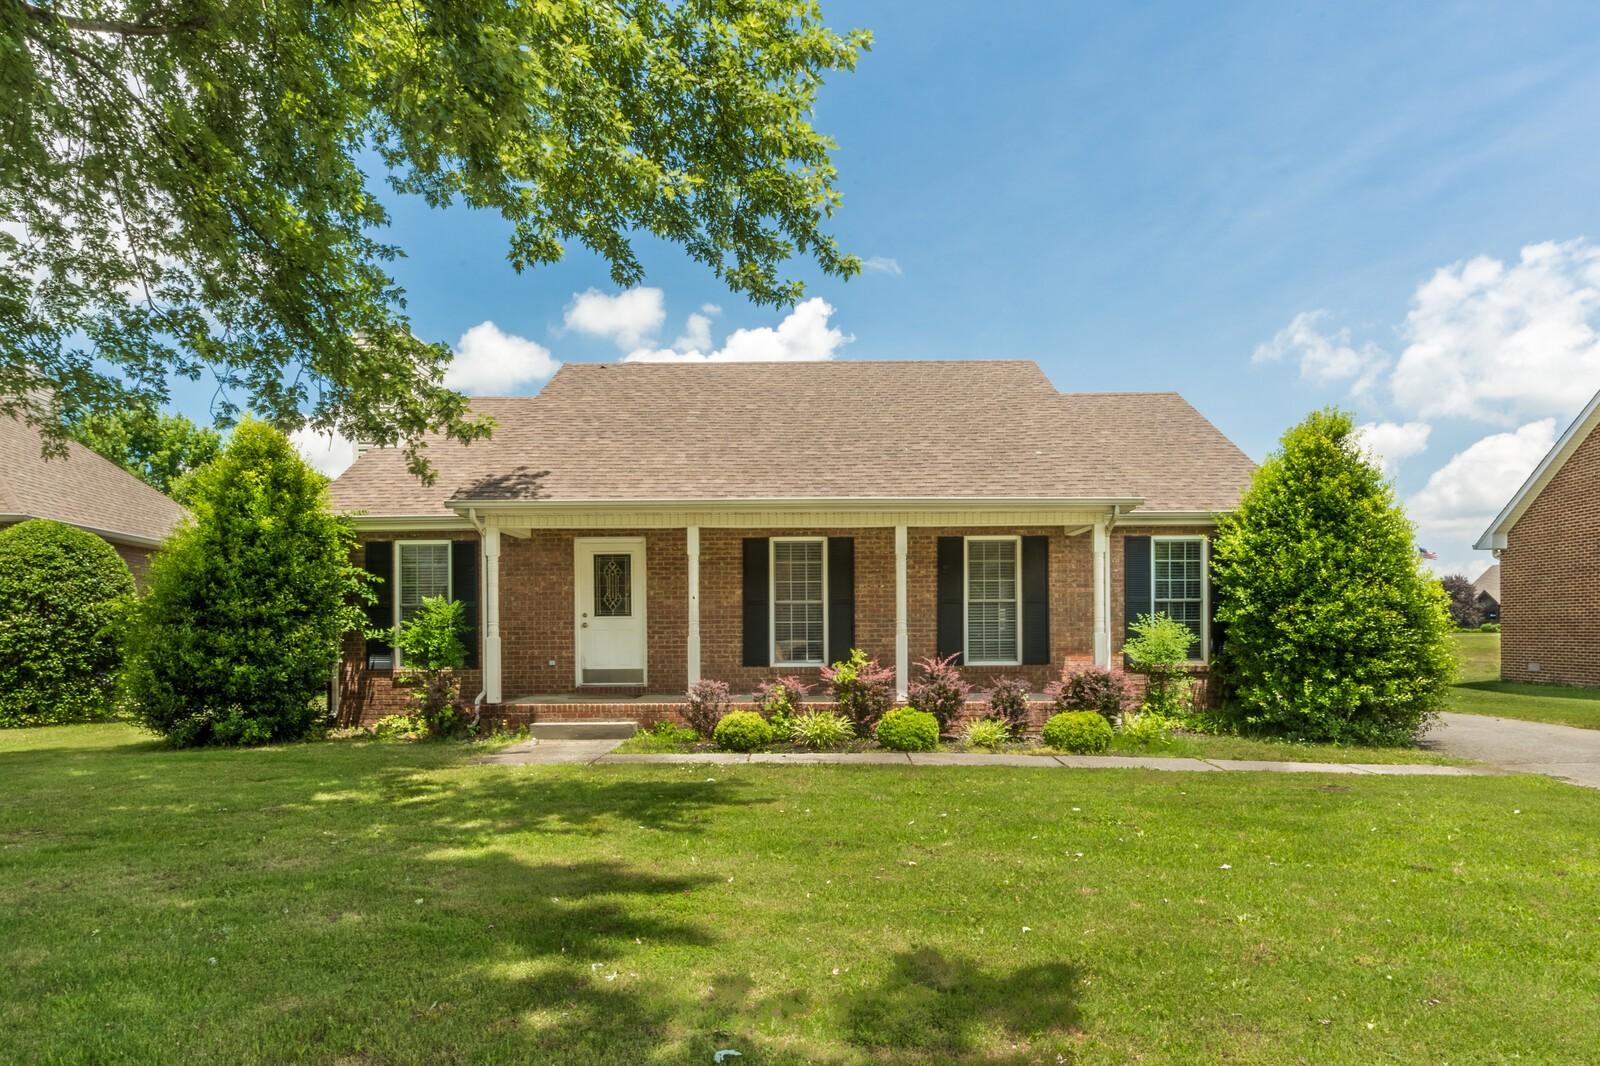 125 Foxrun Property Photo - Springfield, TN real estate listing